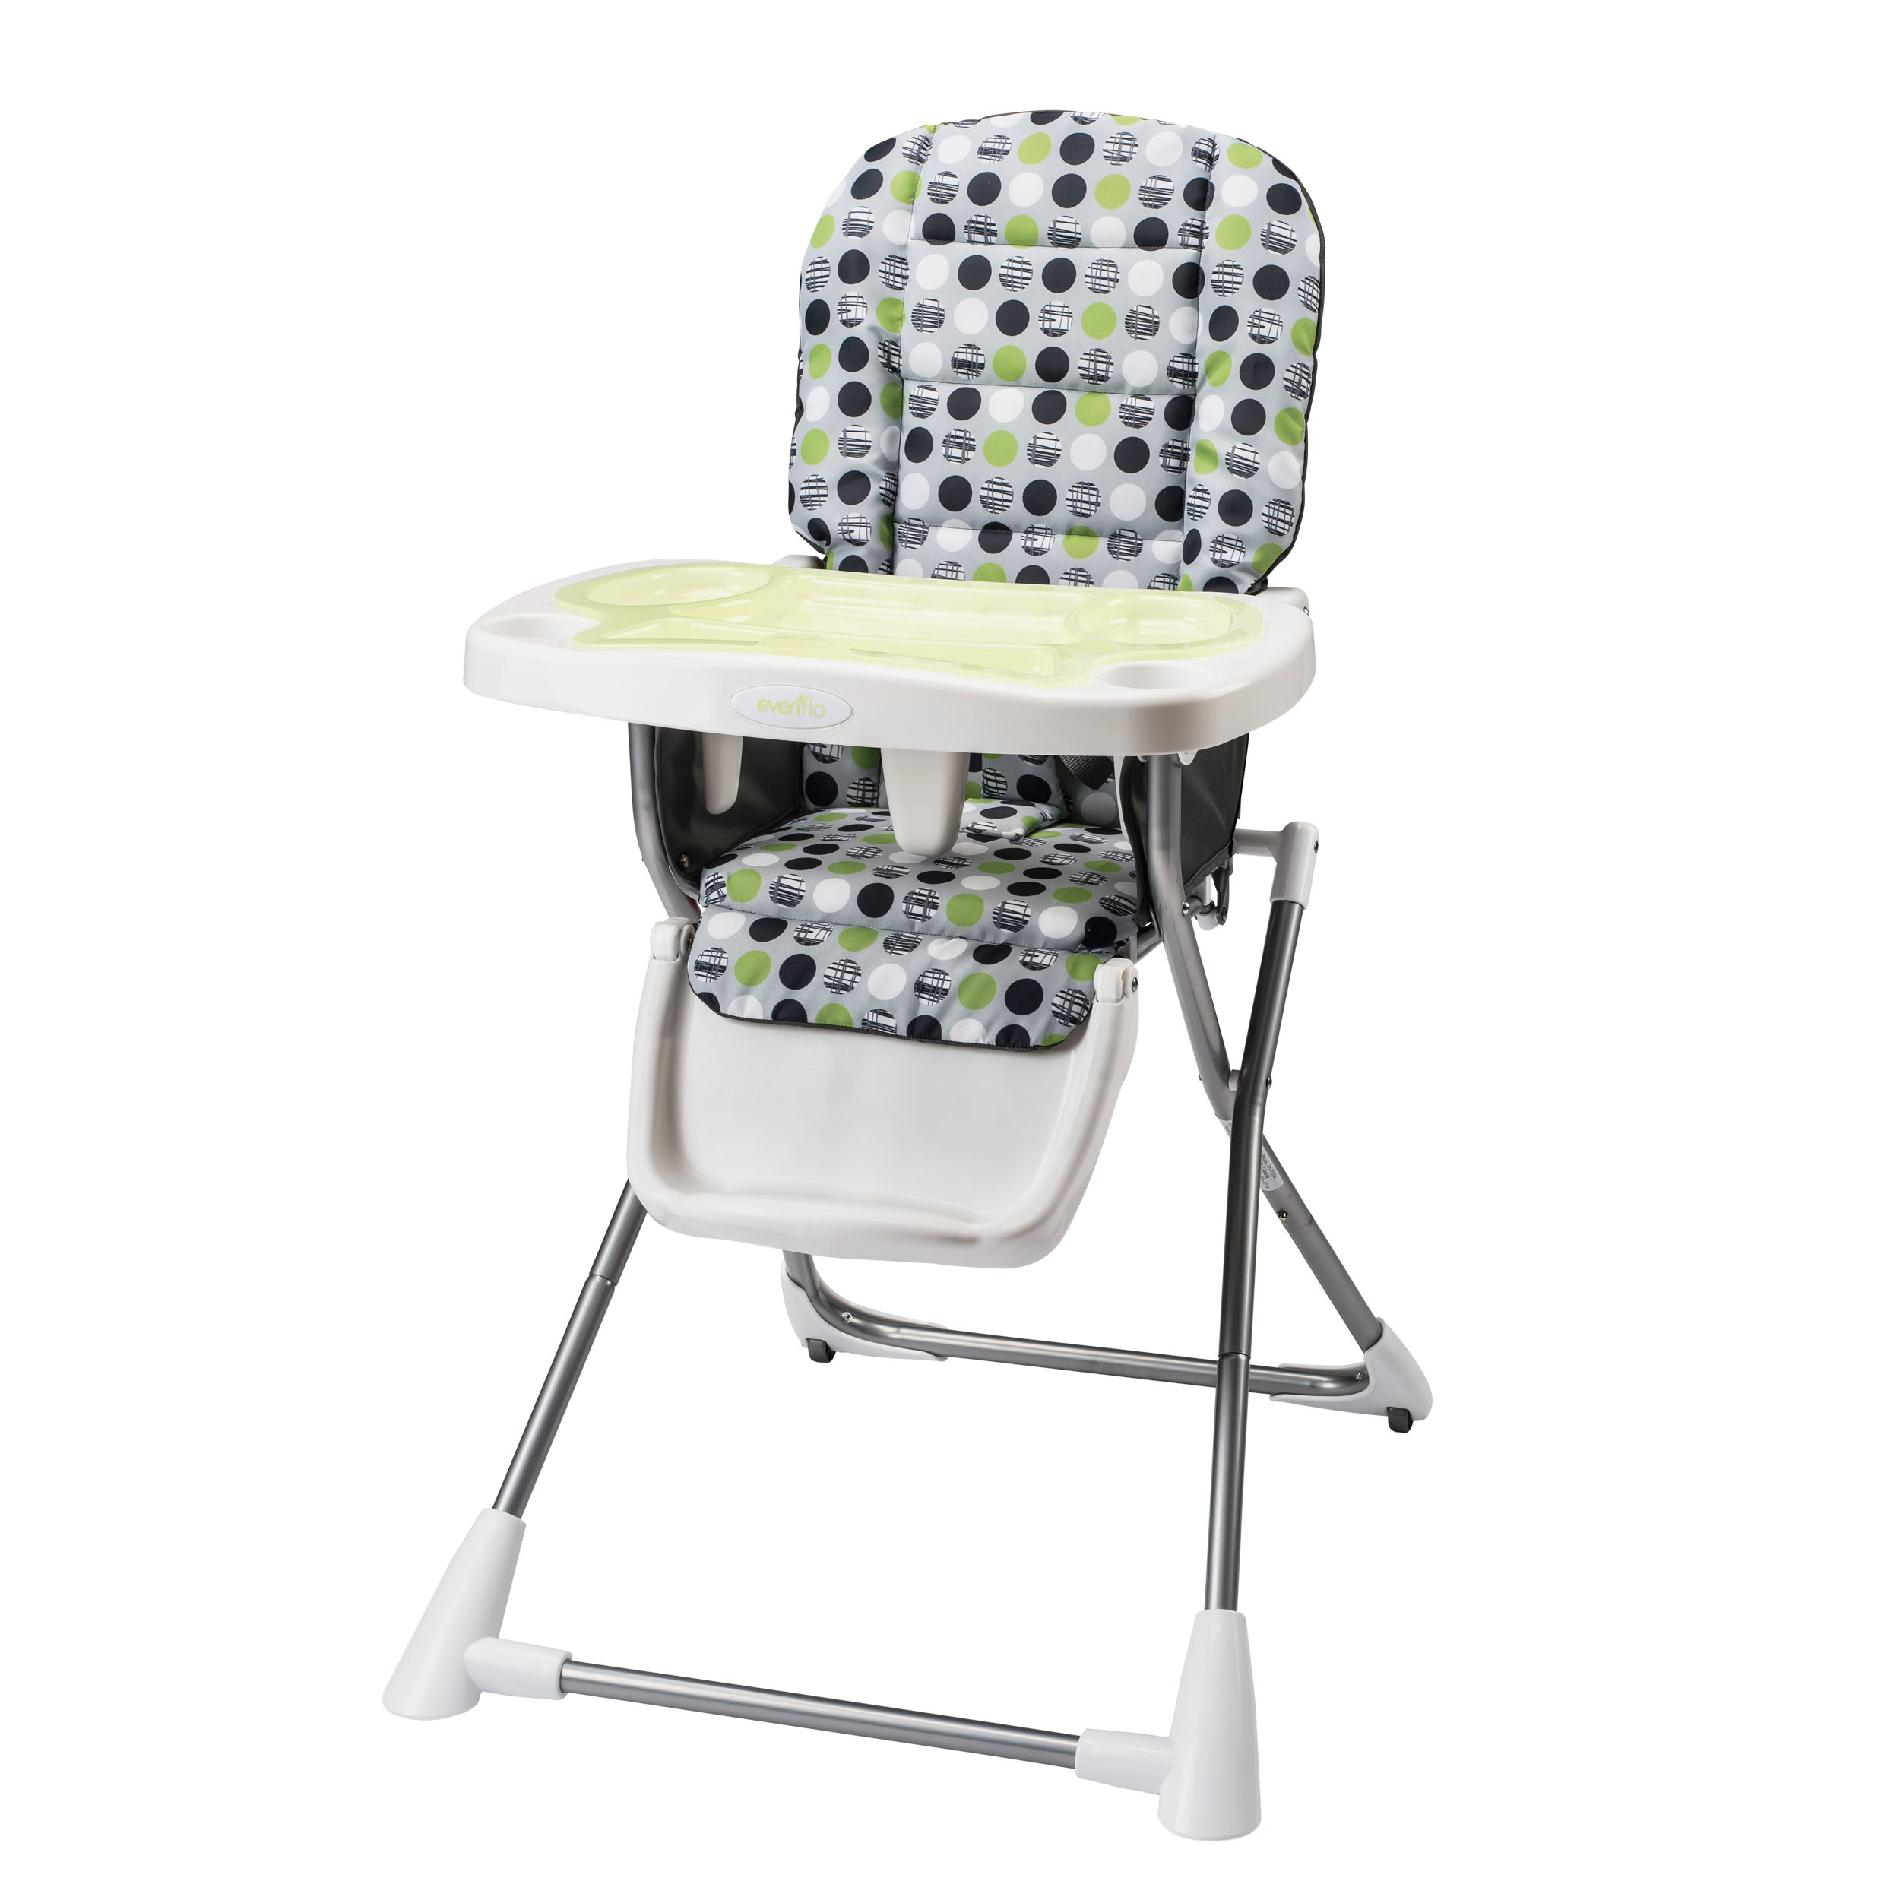 evenflo easy fold high chair mat for carpet compact lima baby feeding